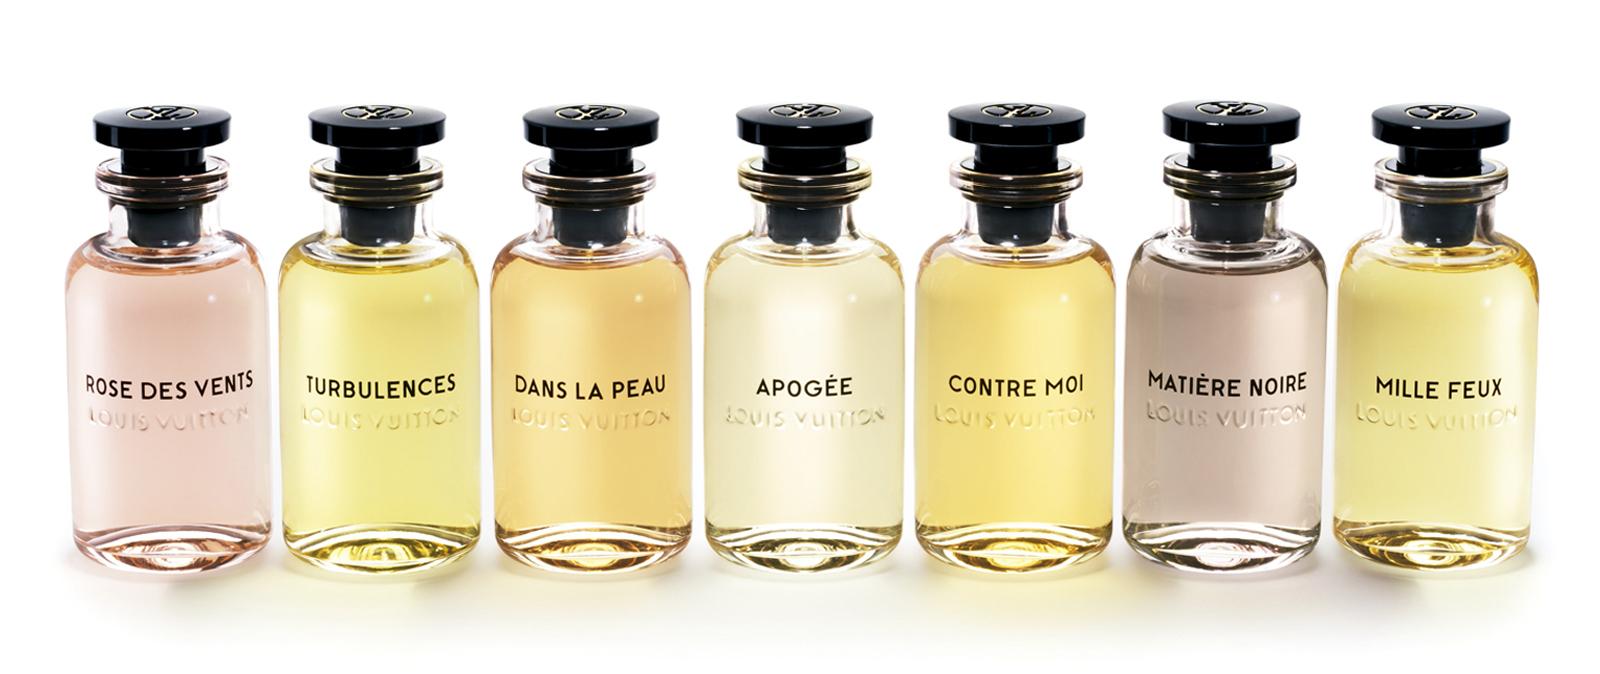 lv-parfums_dresstyle73